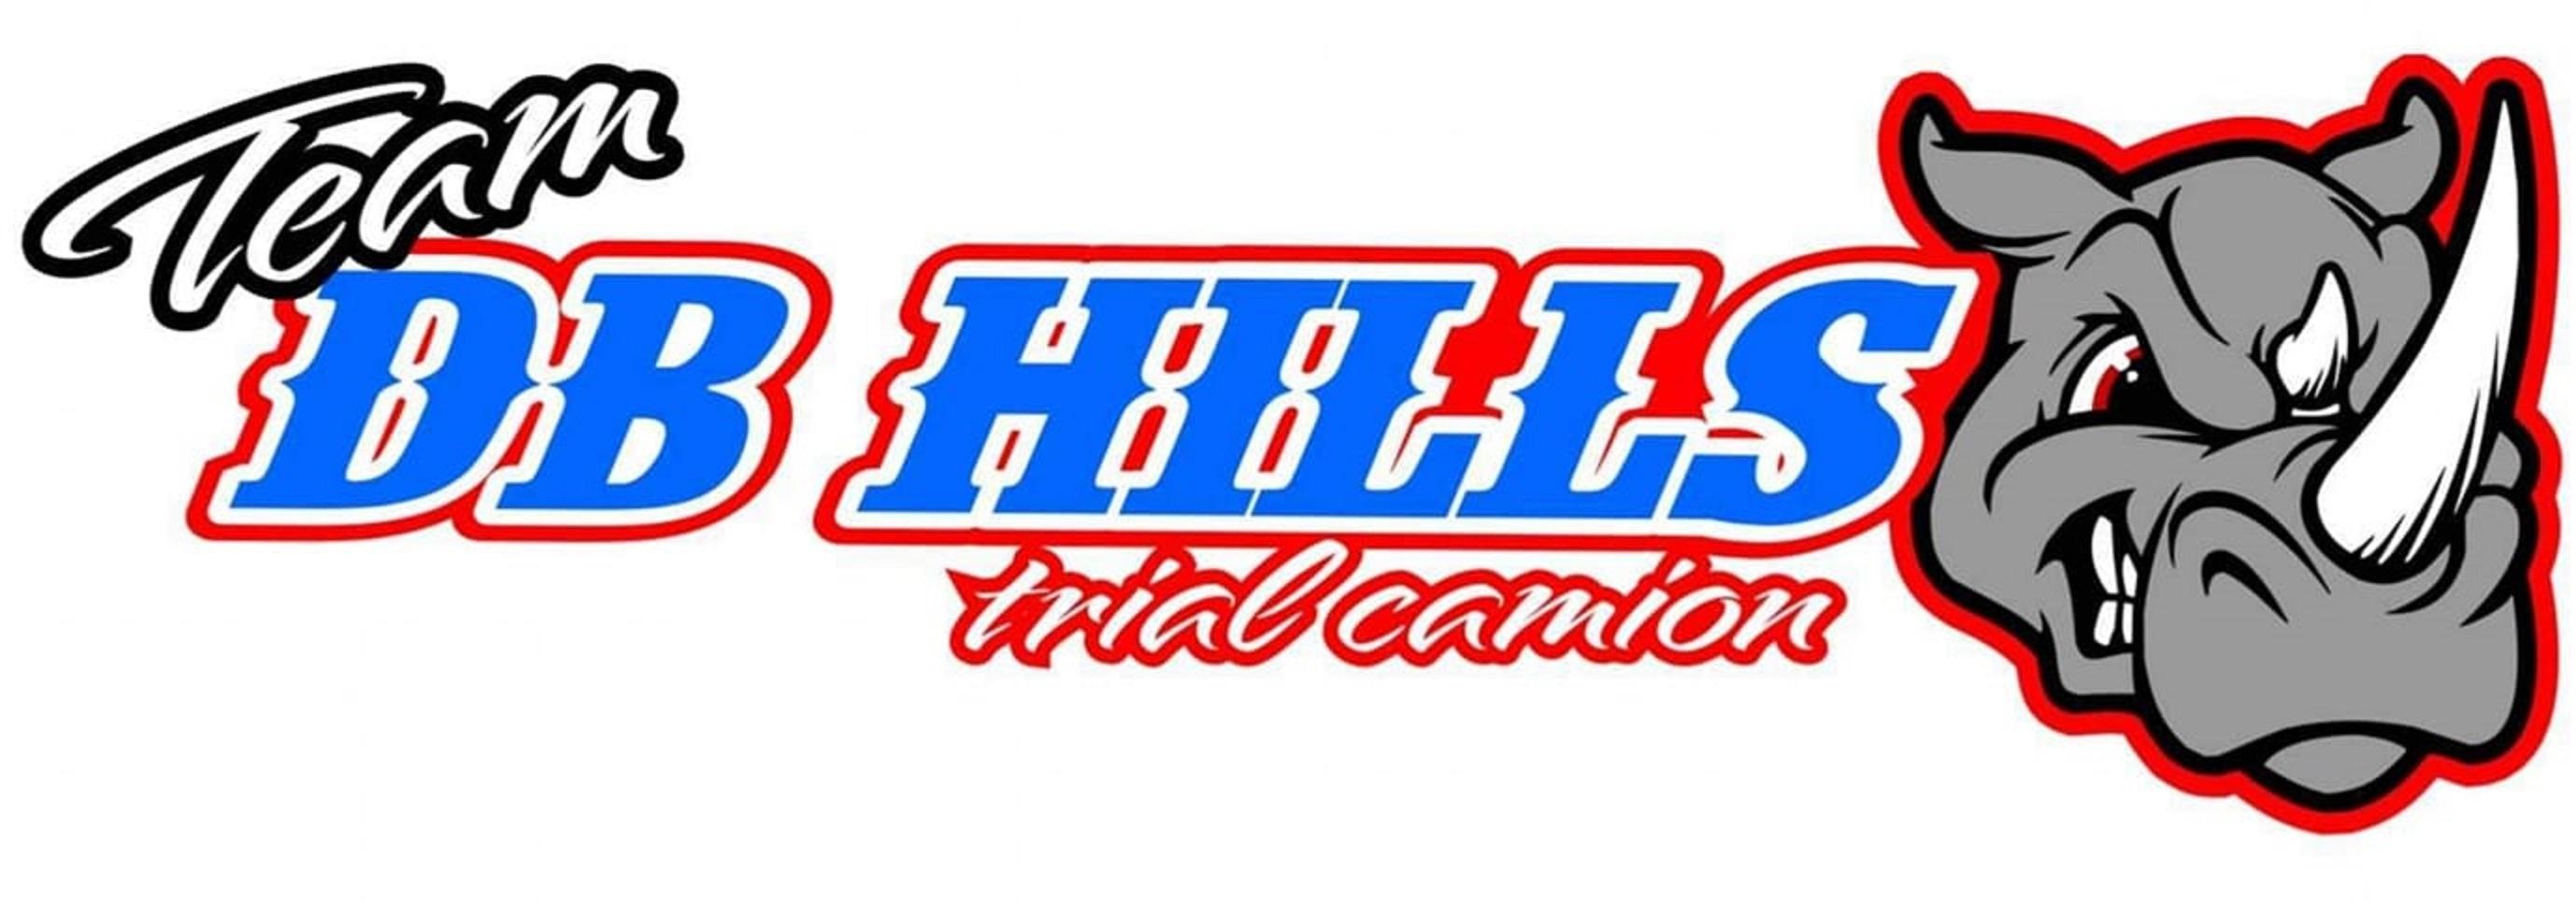 Team DB Hills - LOGO.jpg